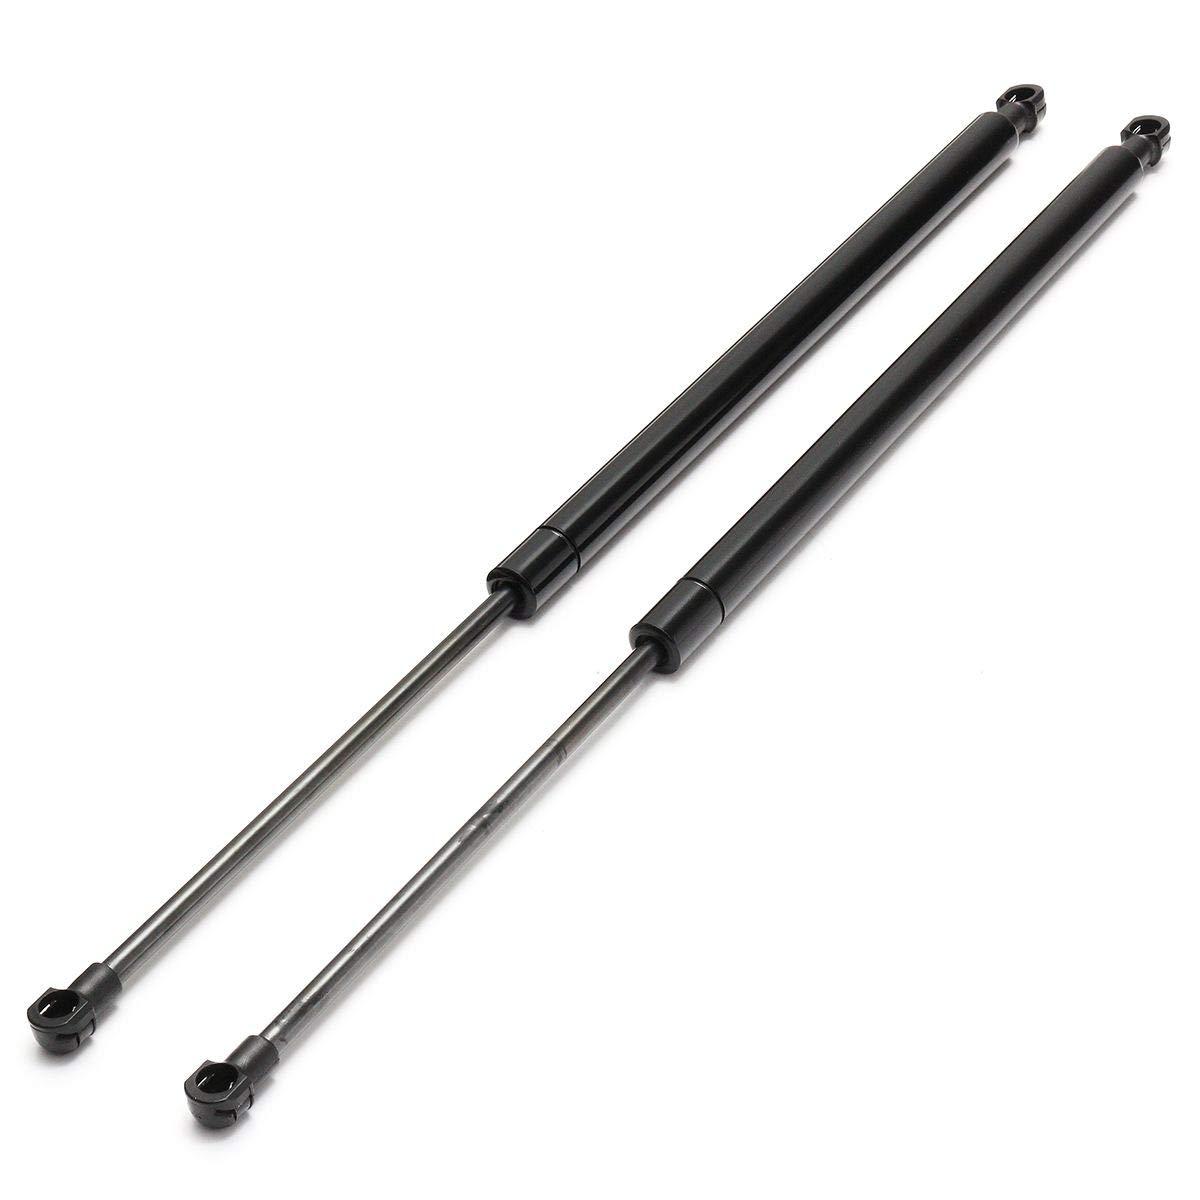 Oneuda 2pcs Car Front Left/&Right Hood Lift Support Shock Strut Arm For Lexus GS300 GS350 GS430 GS460 2005-2012